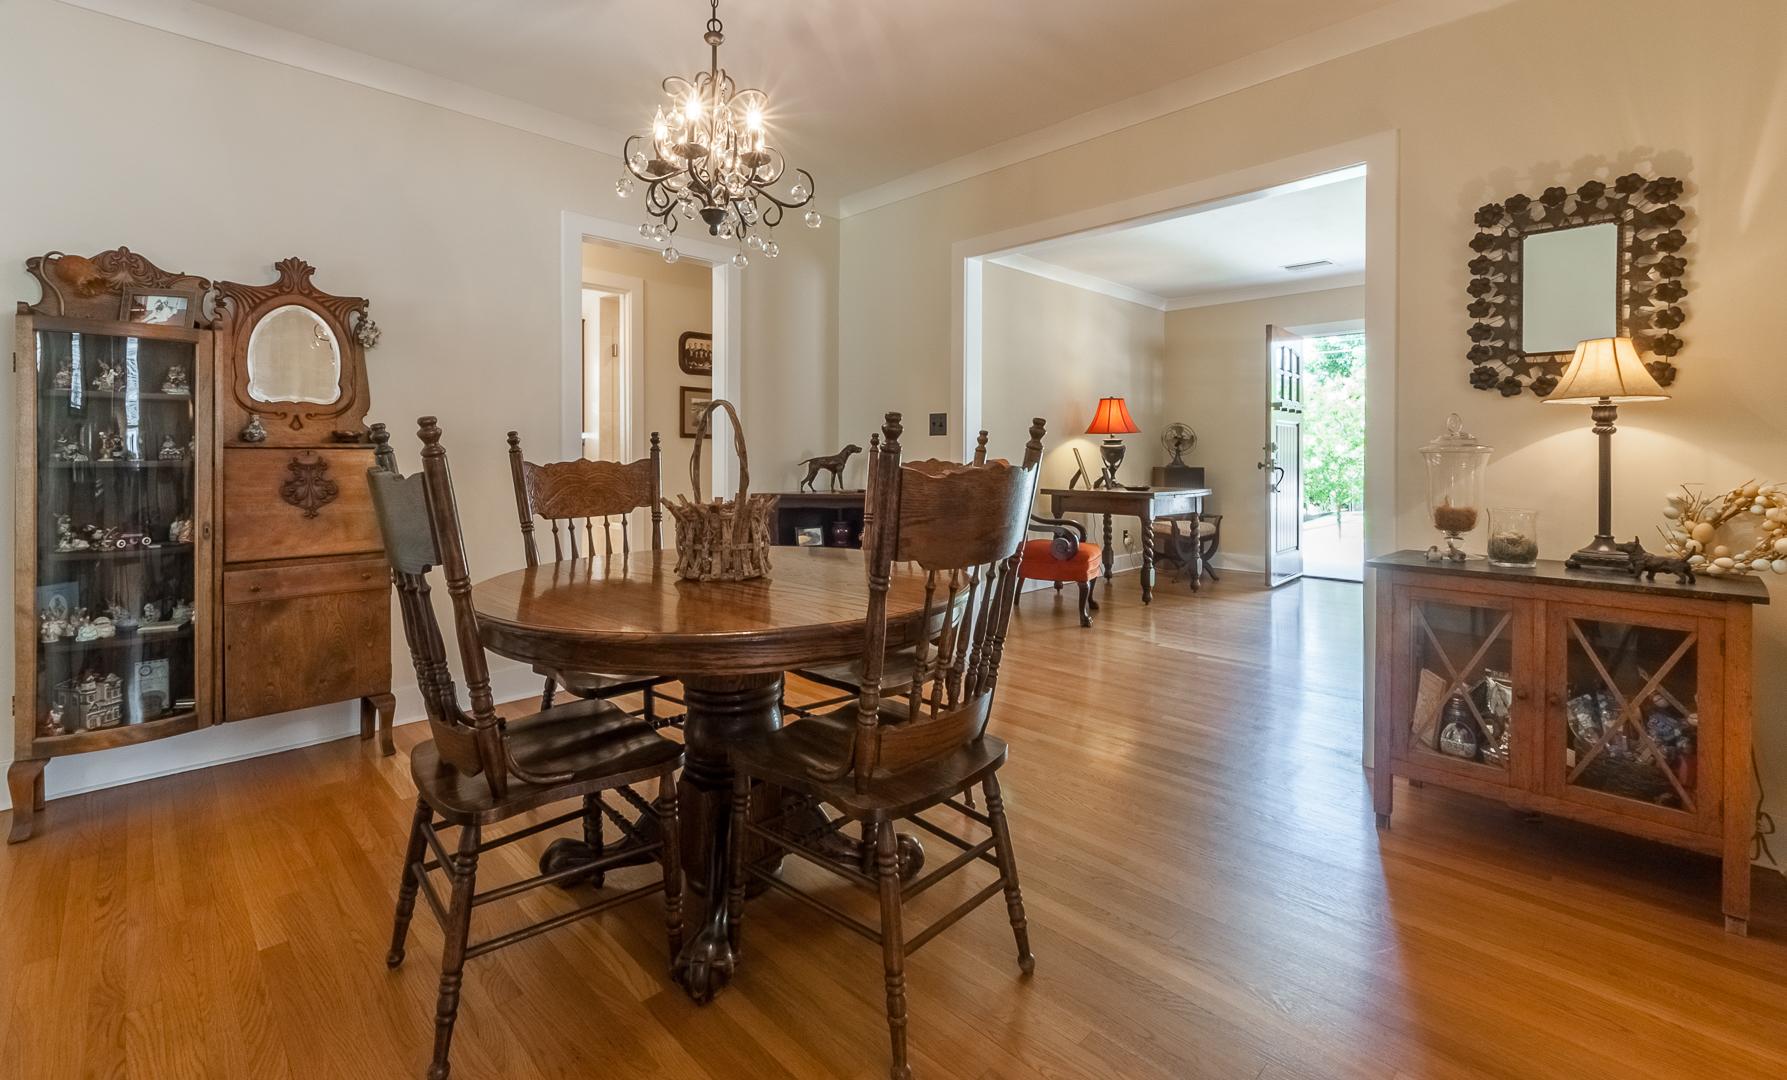 6 - Dining Room open floorplan